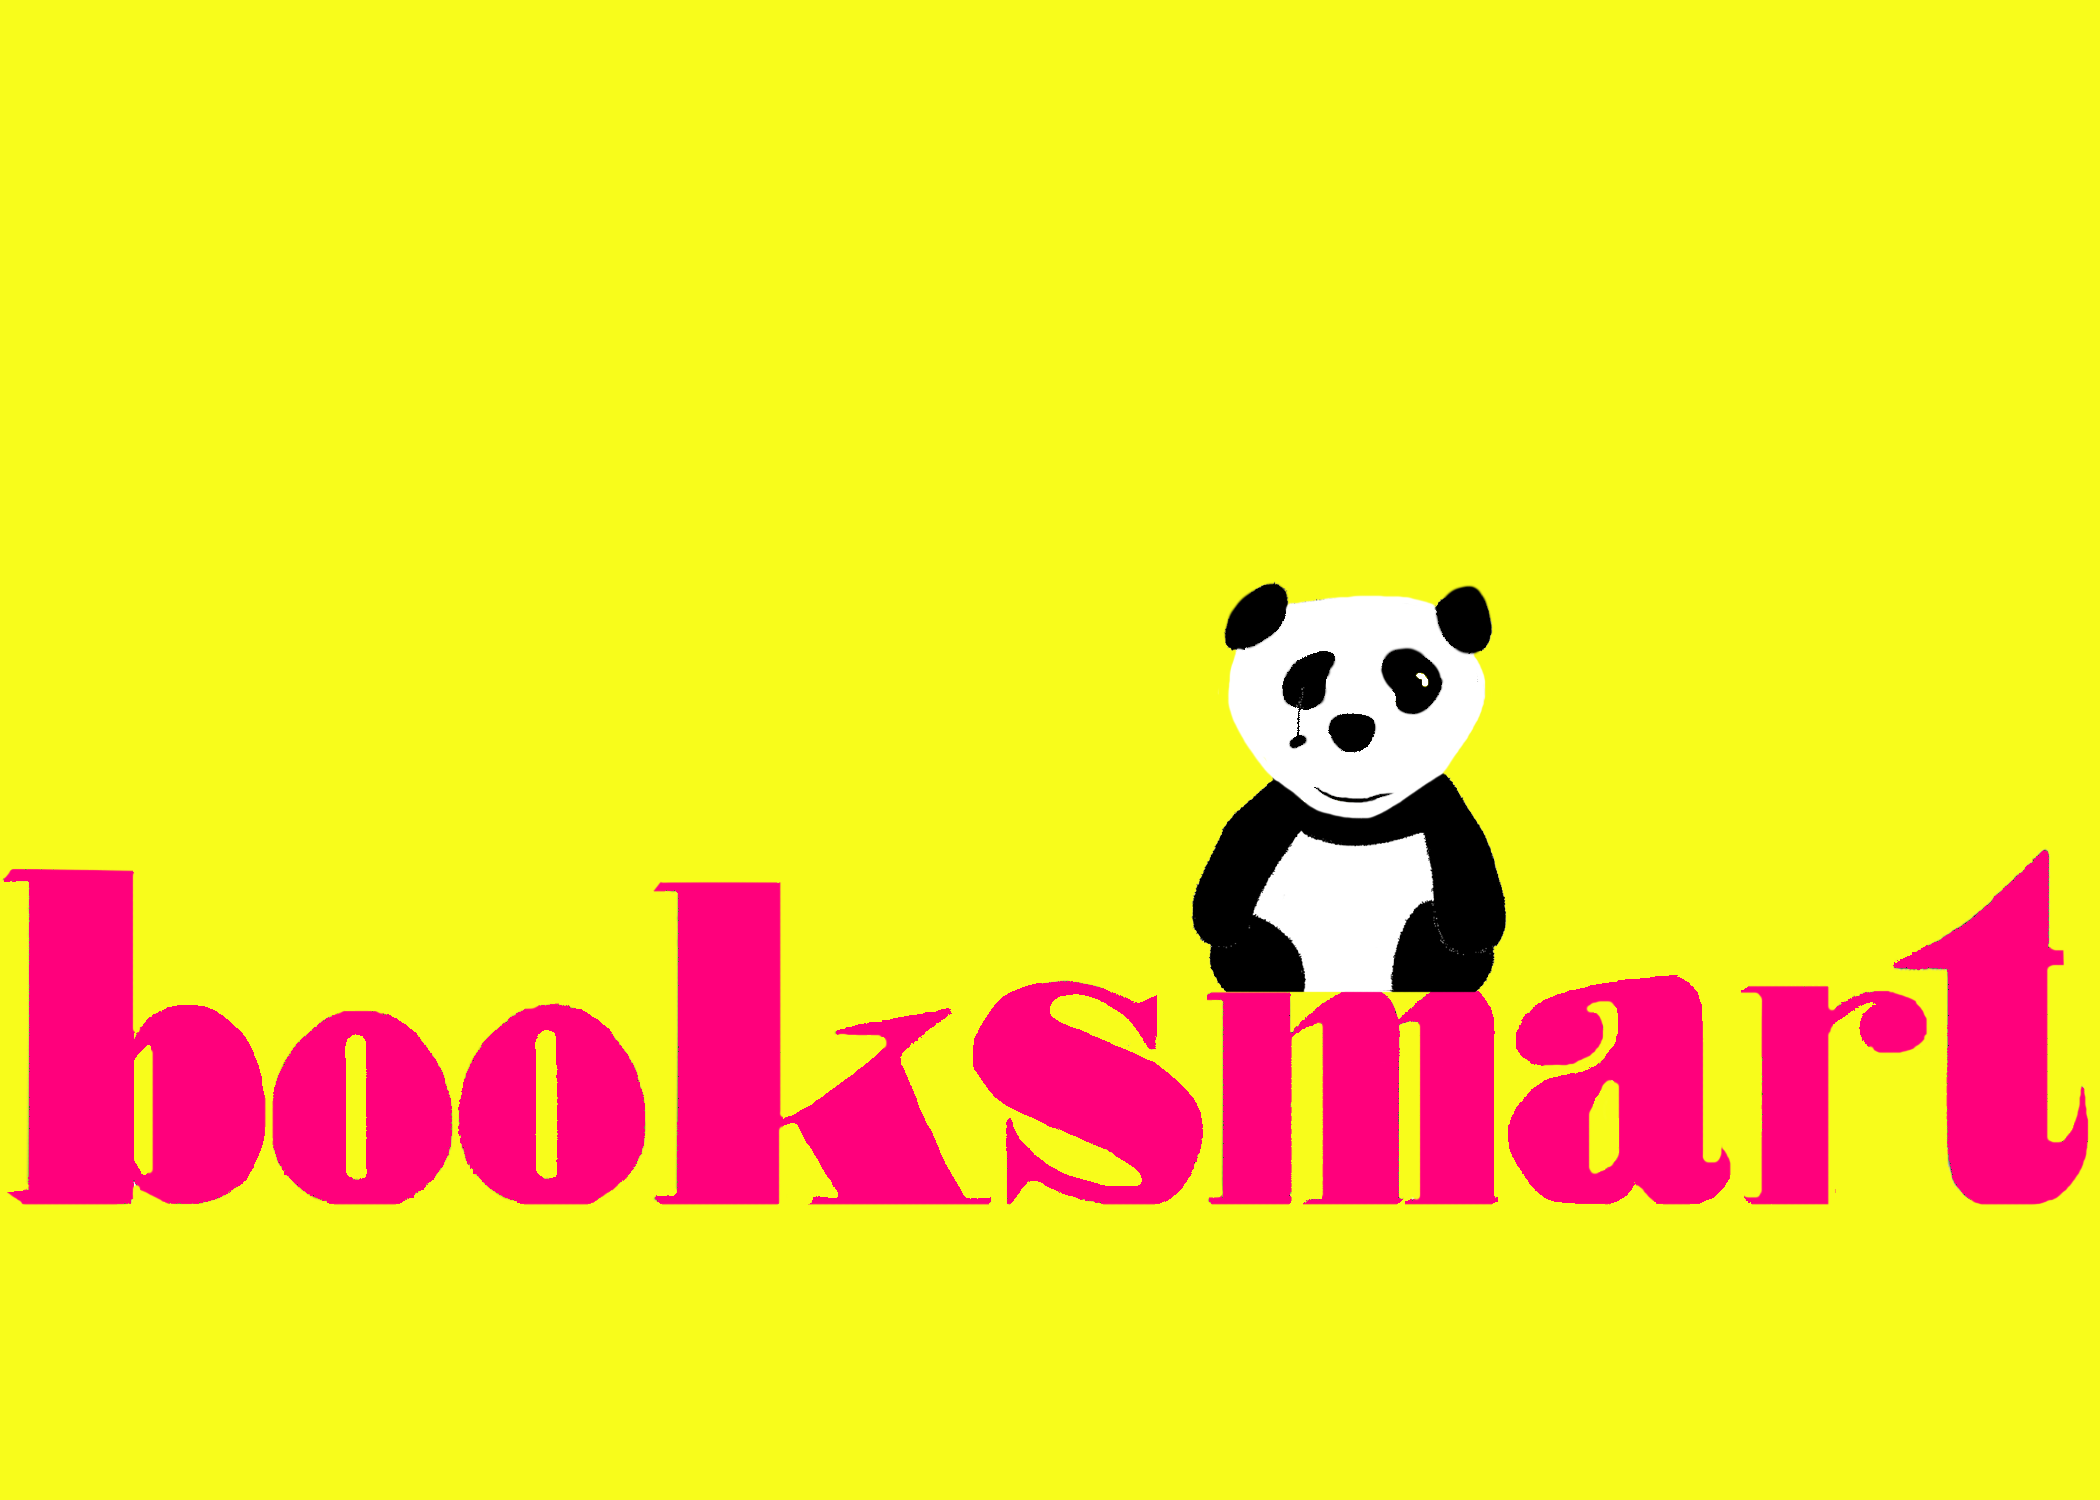 Booksmart.png